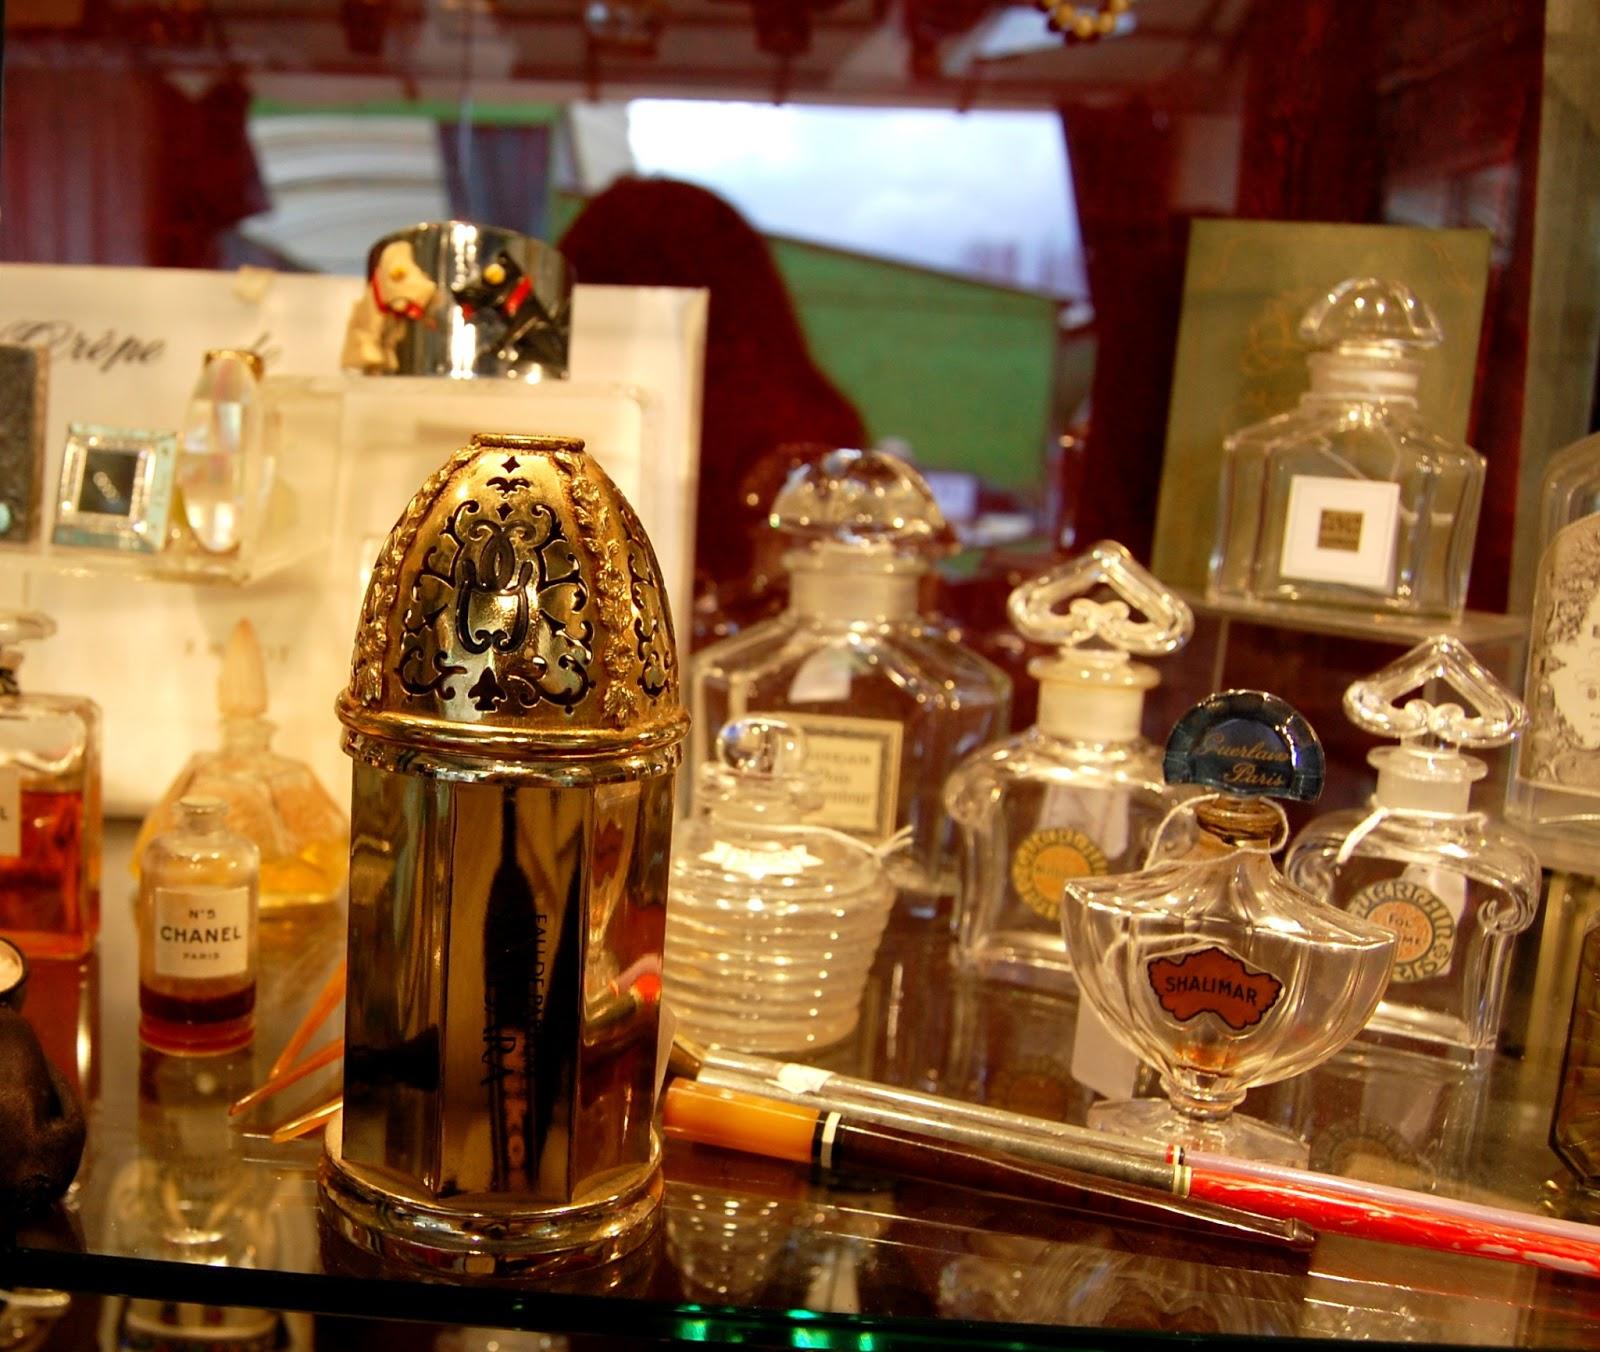 Salon Parfum Milly La Flacon De ForetEurydice Organisateur Du A Yb76Ifmvyg